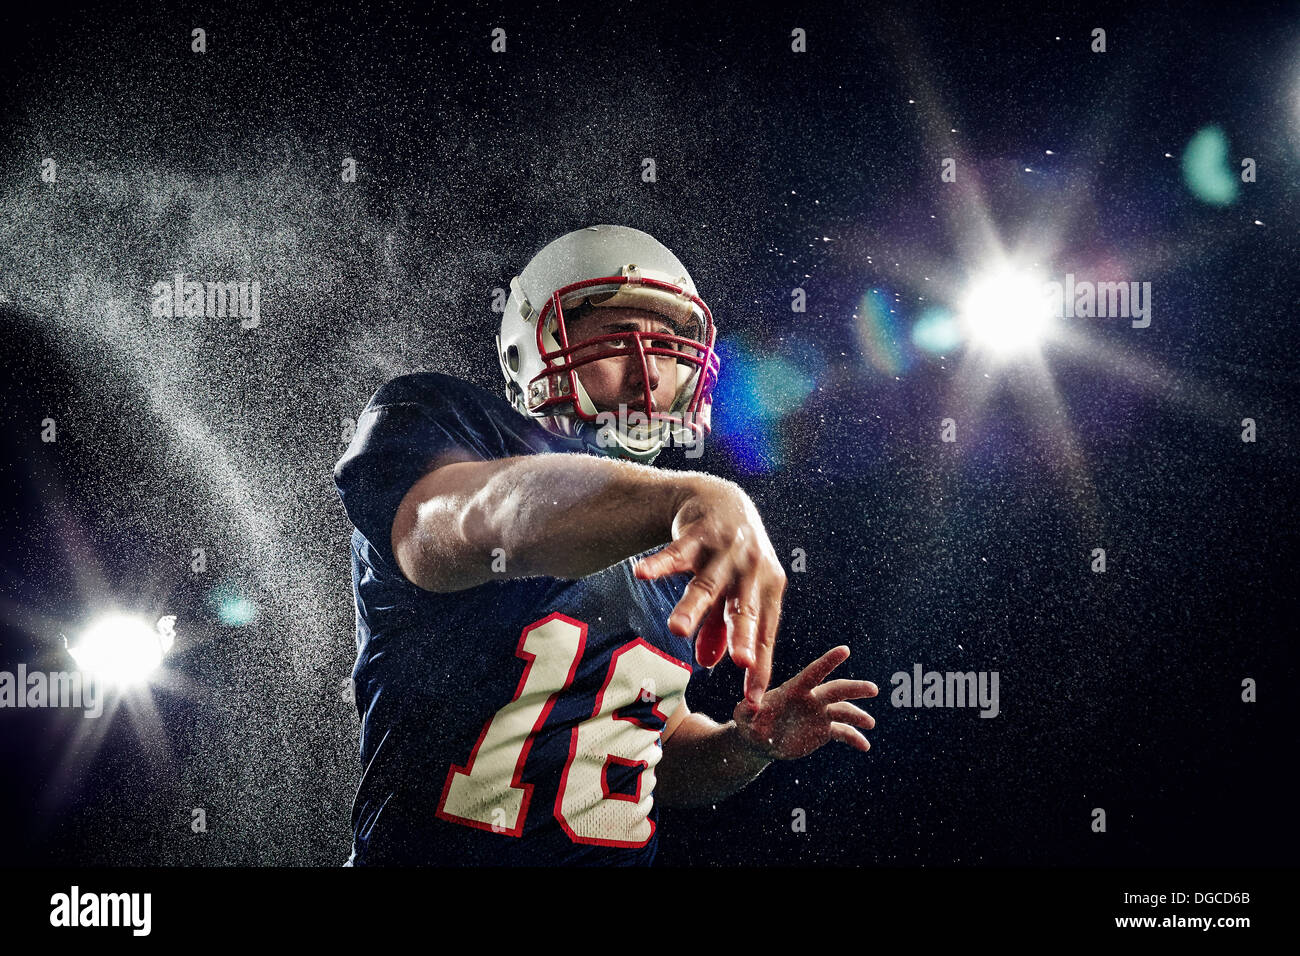 American footballer throwing - Stock Image